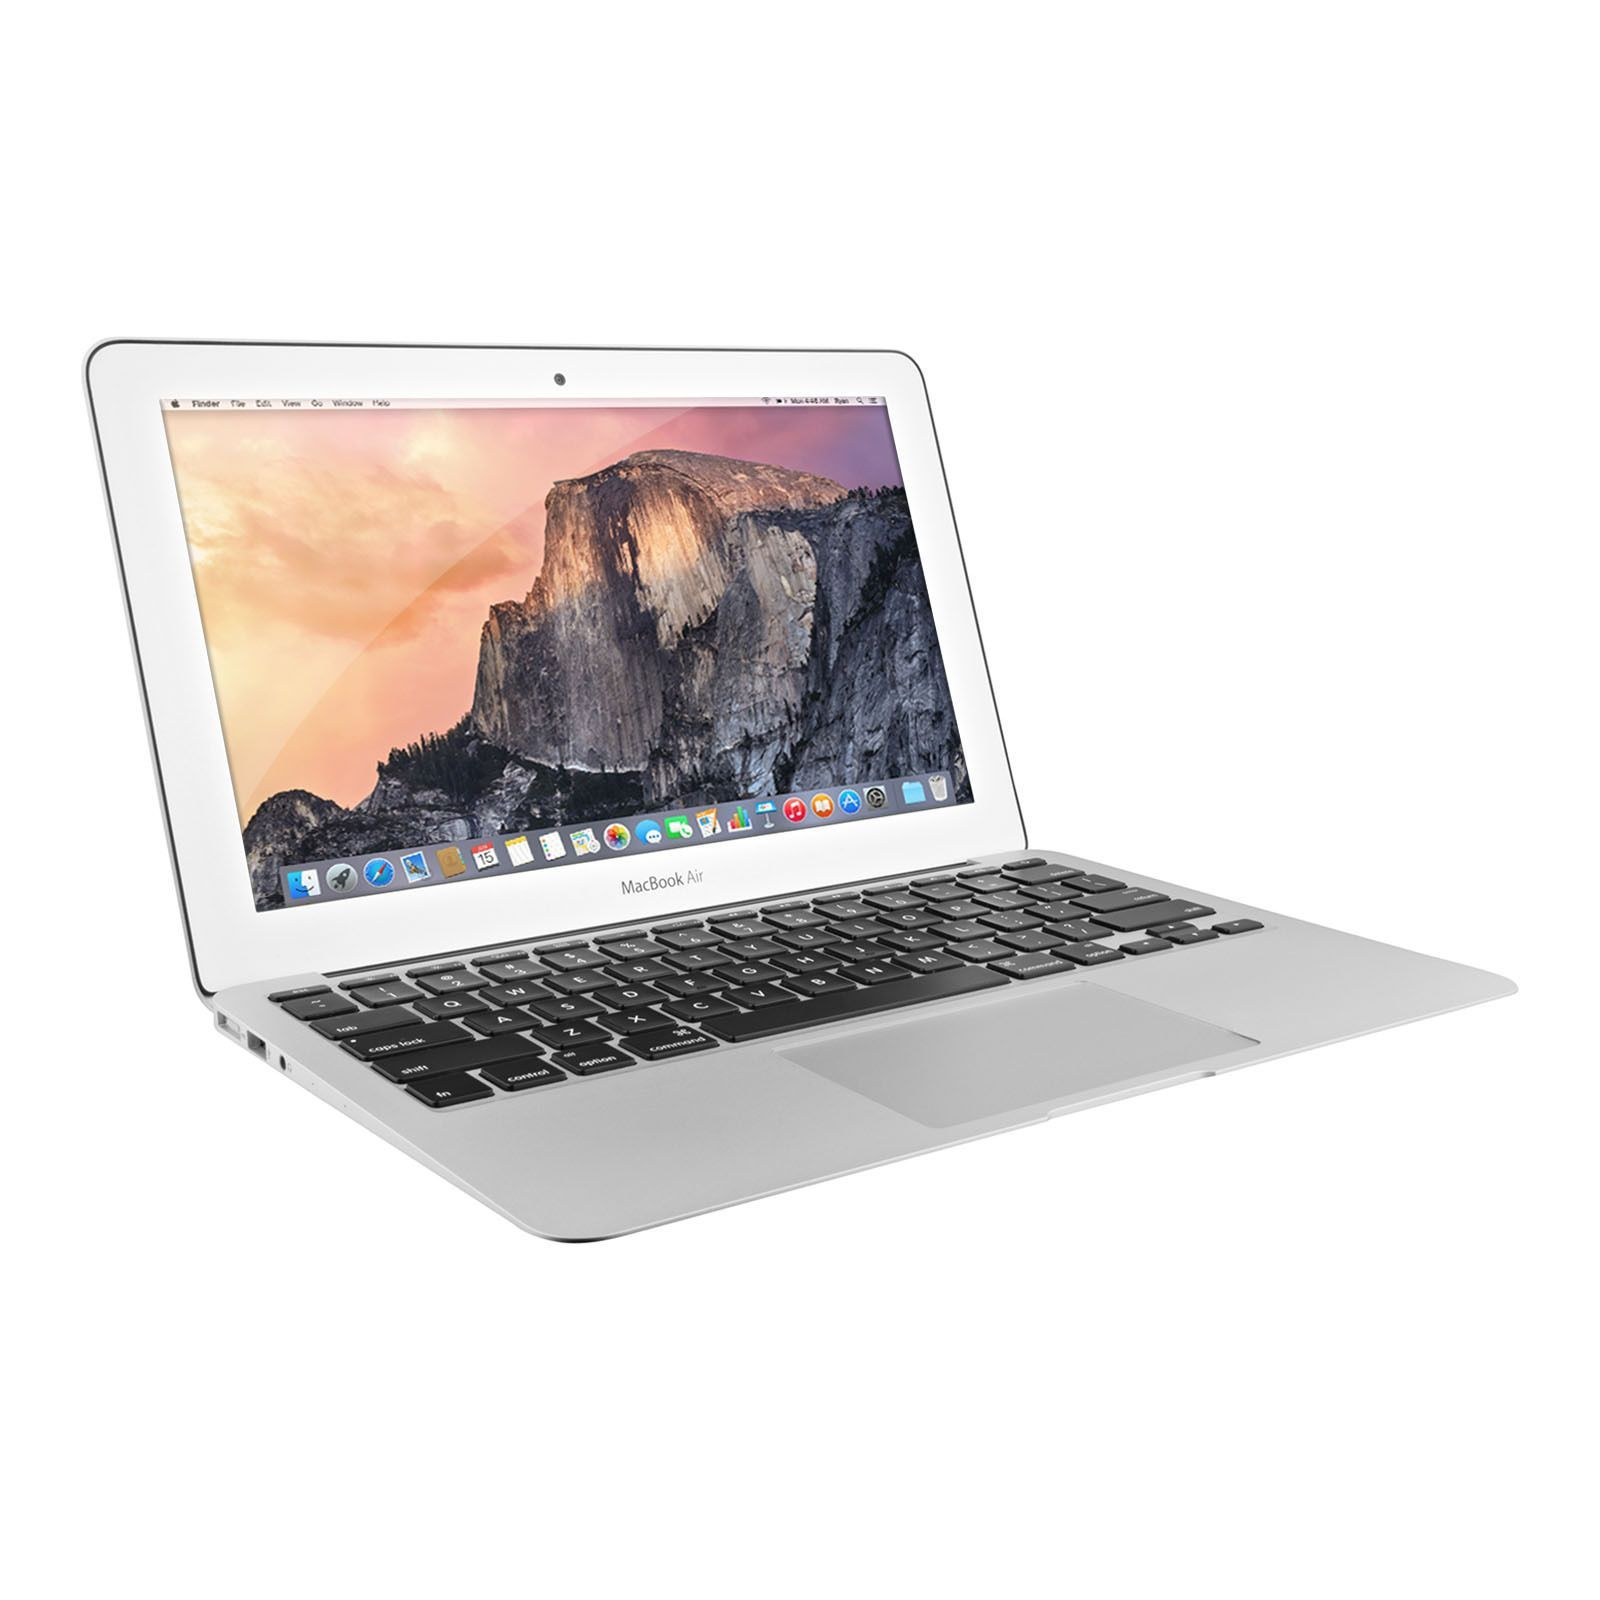 "Apple Macbook Air 11.6"" 1.4 Ghz Core I5 128 Gb Ssd, 4Gb"